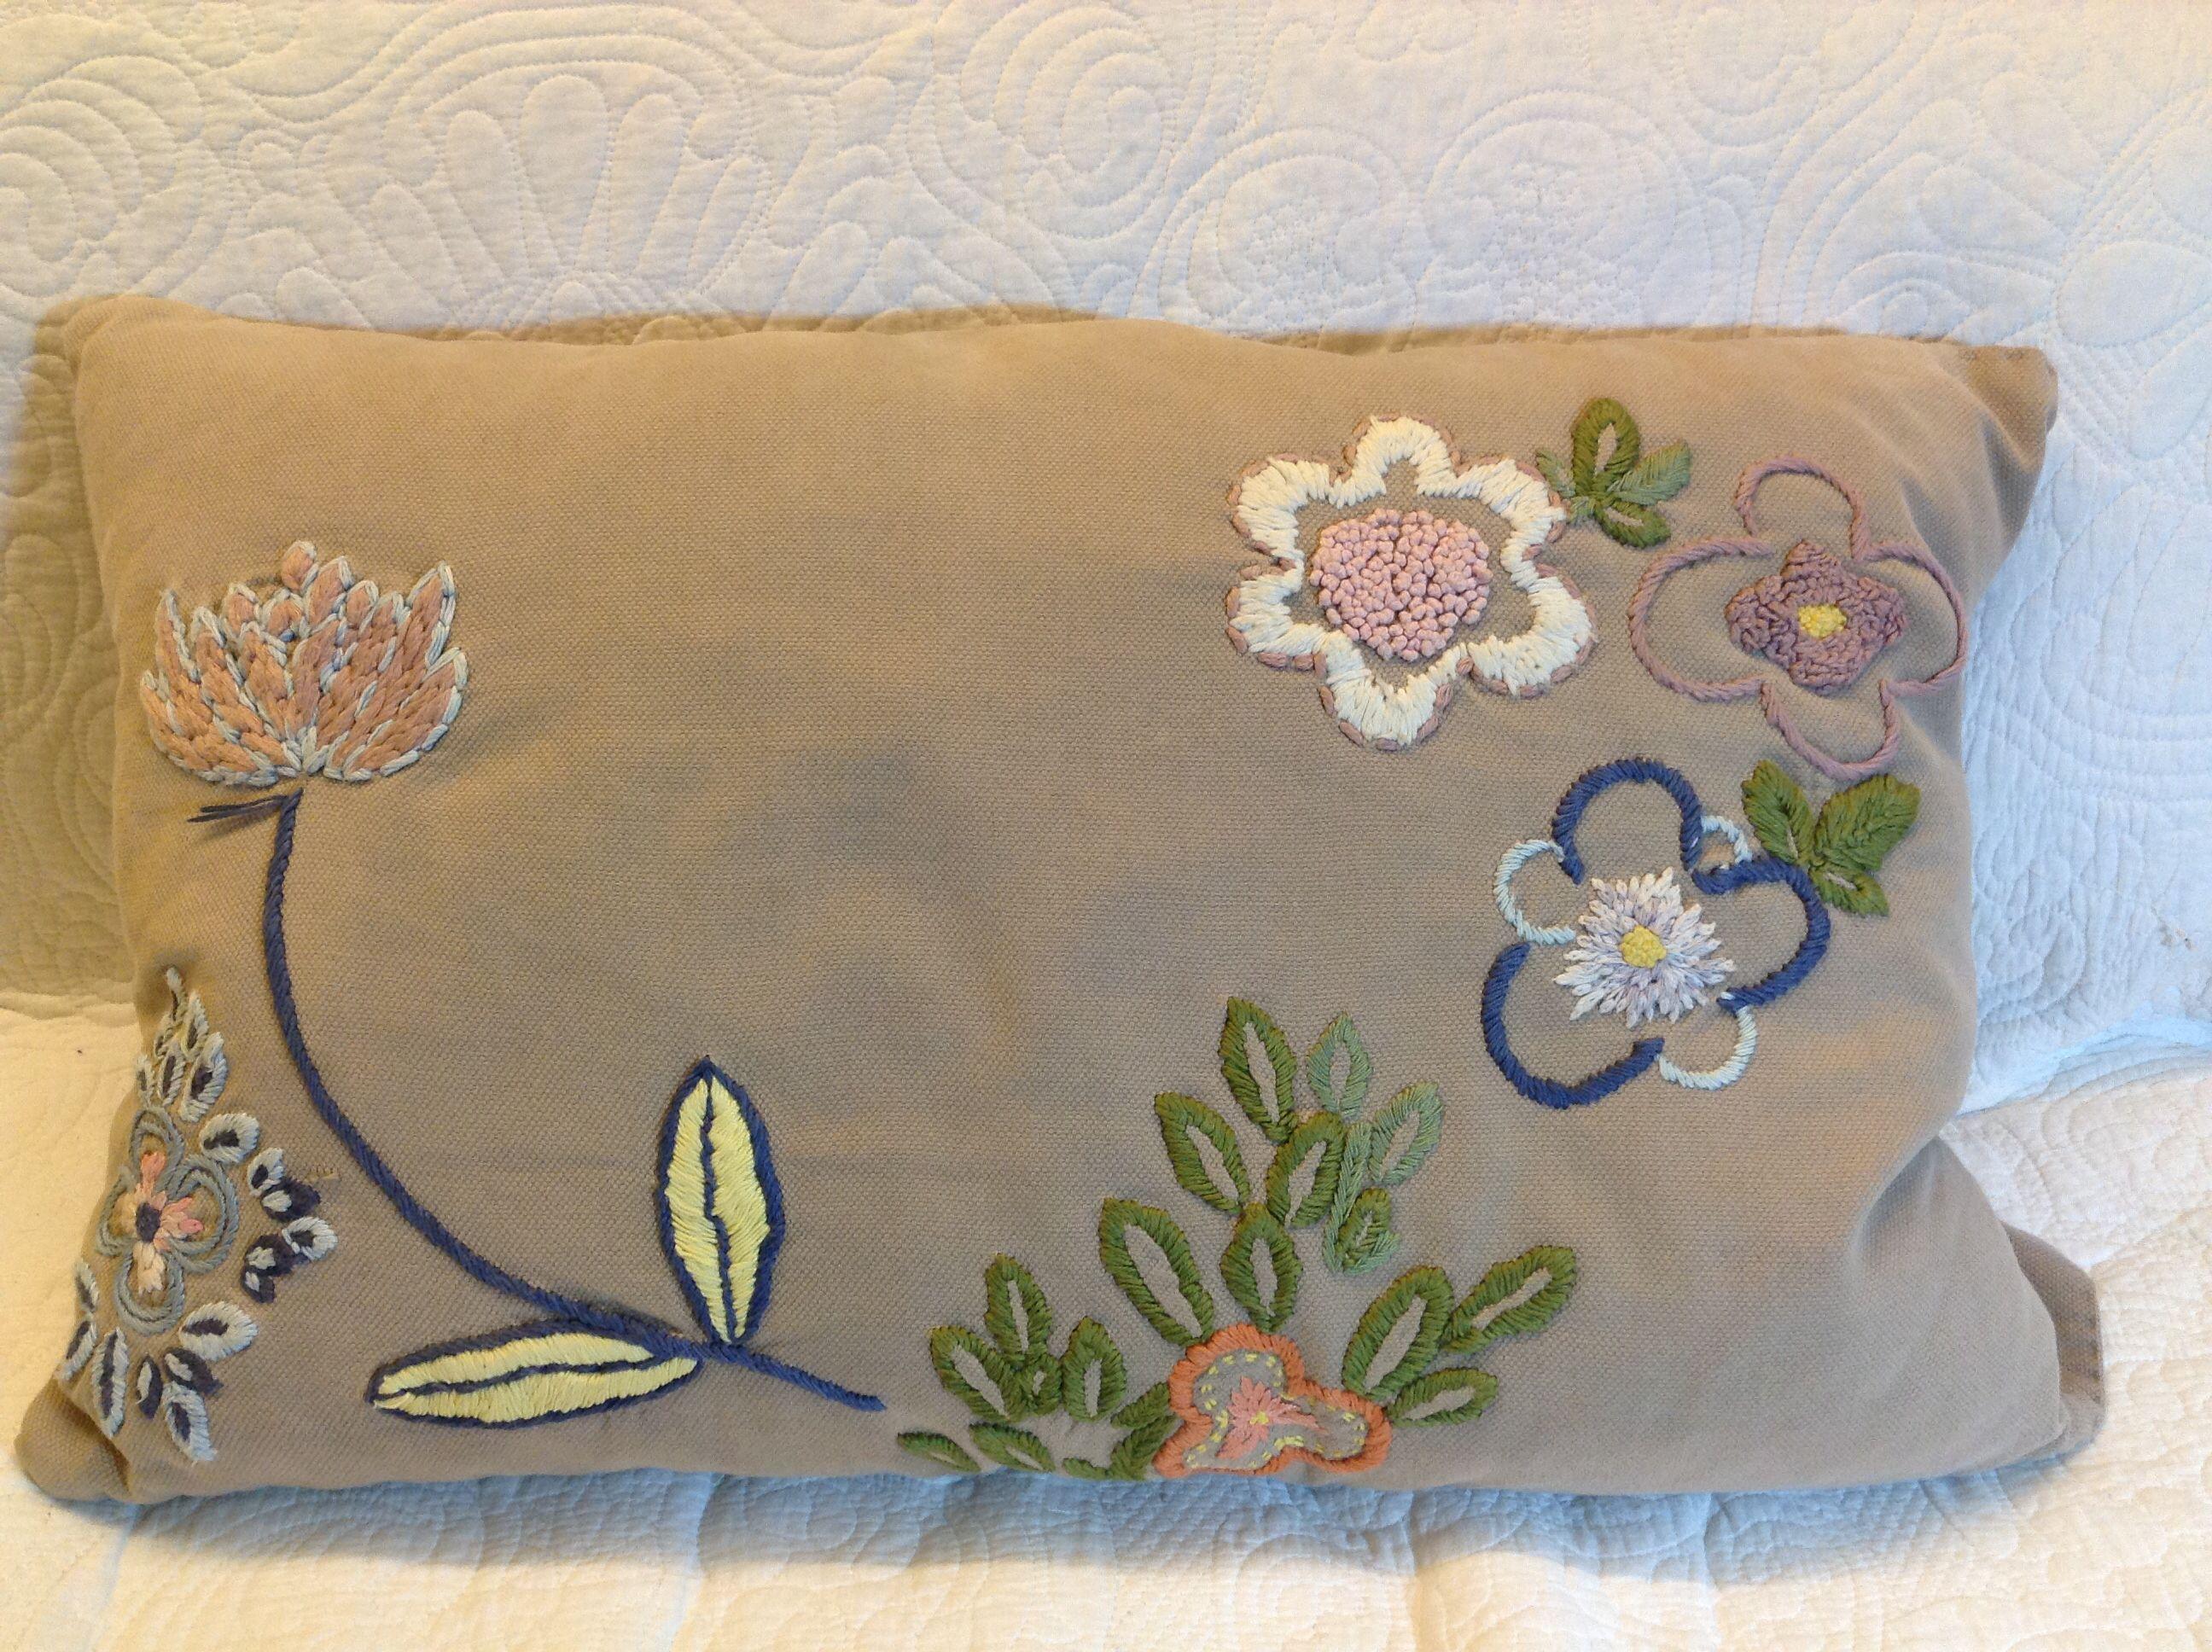 My hand cushion